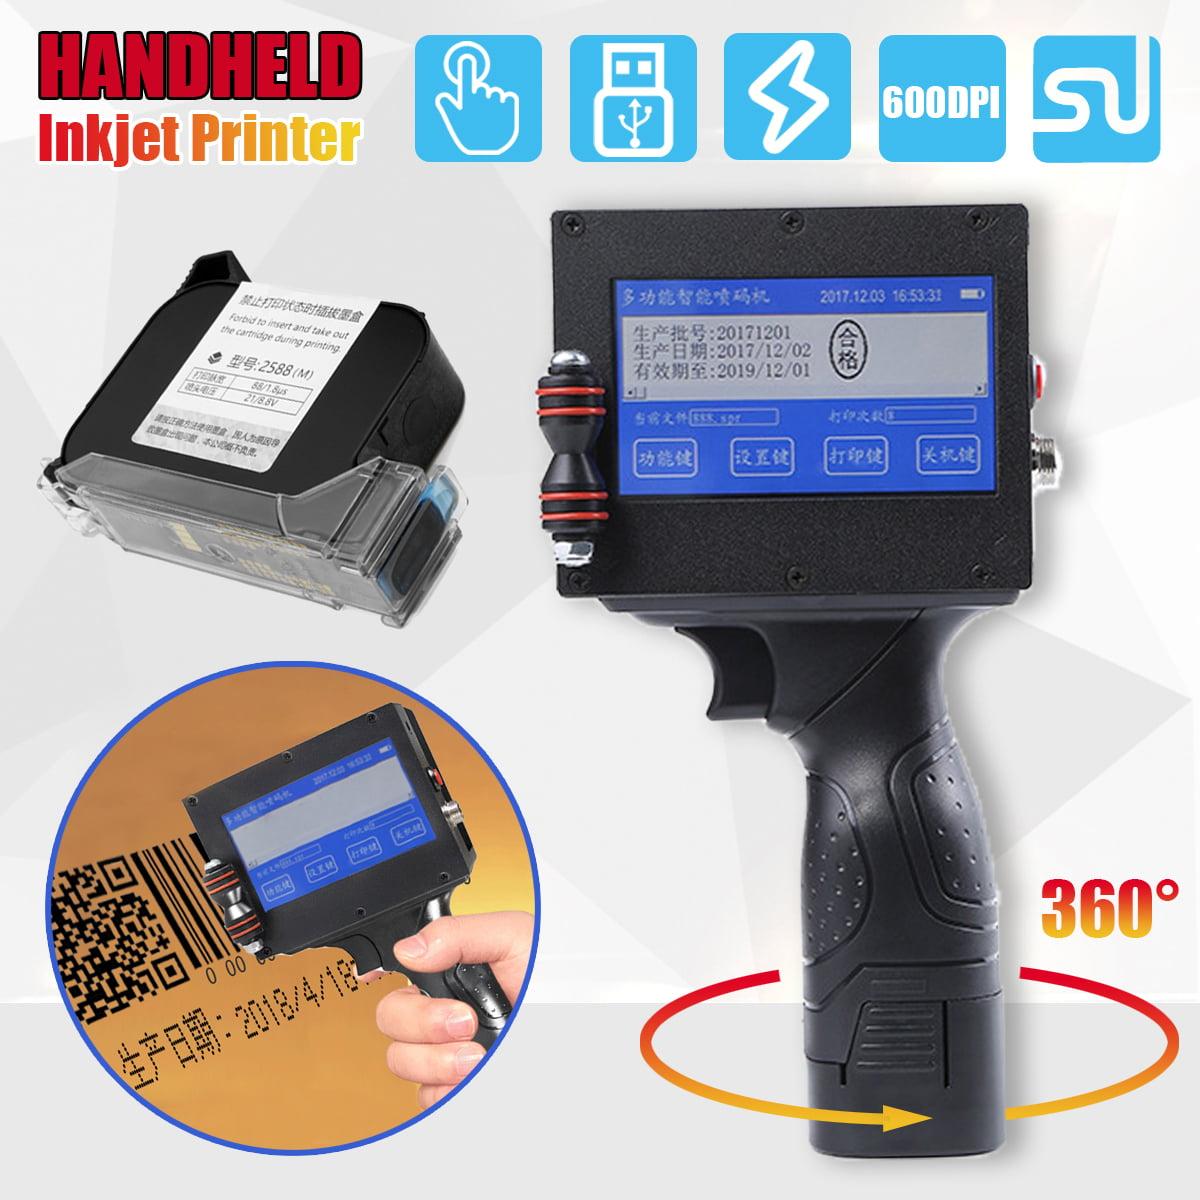 LED Touch Screen Handheld Smart Intelligent Inkjet Printer Coding Marking codingmachine Machine Jet Printing Date Graphics QR Code Black ink cartridge